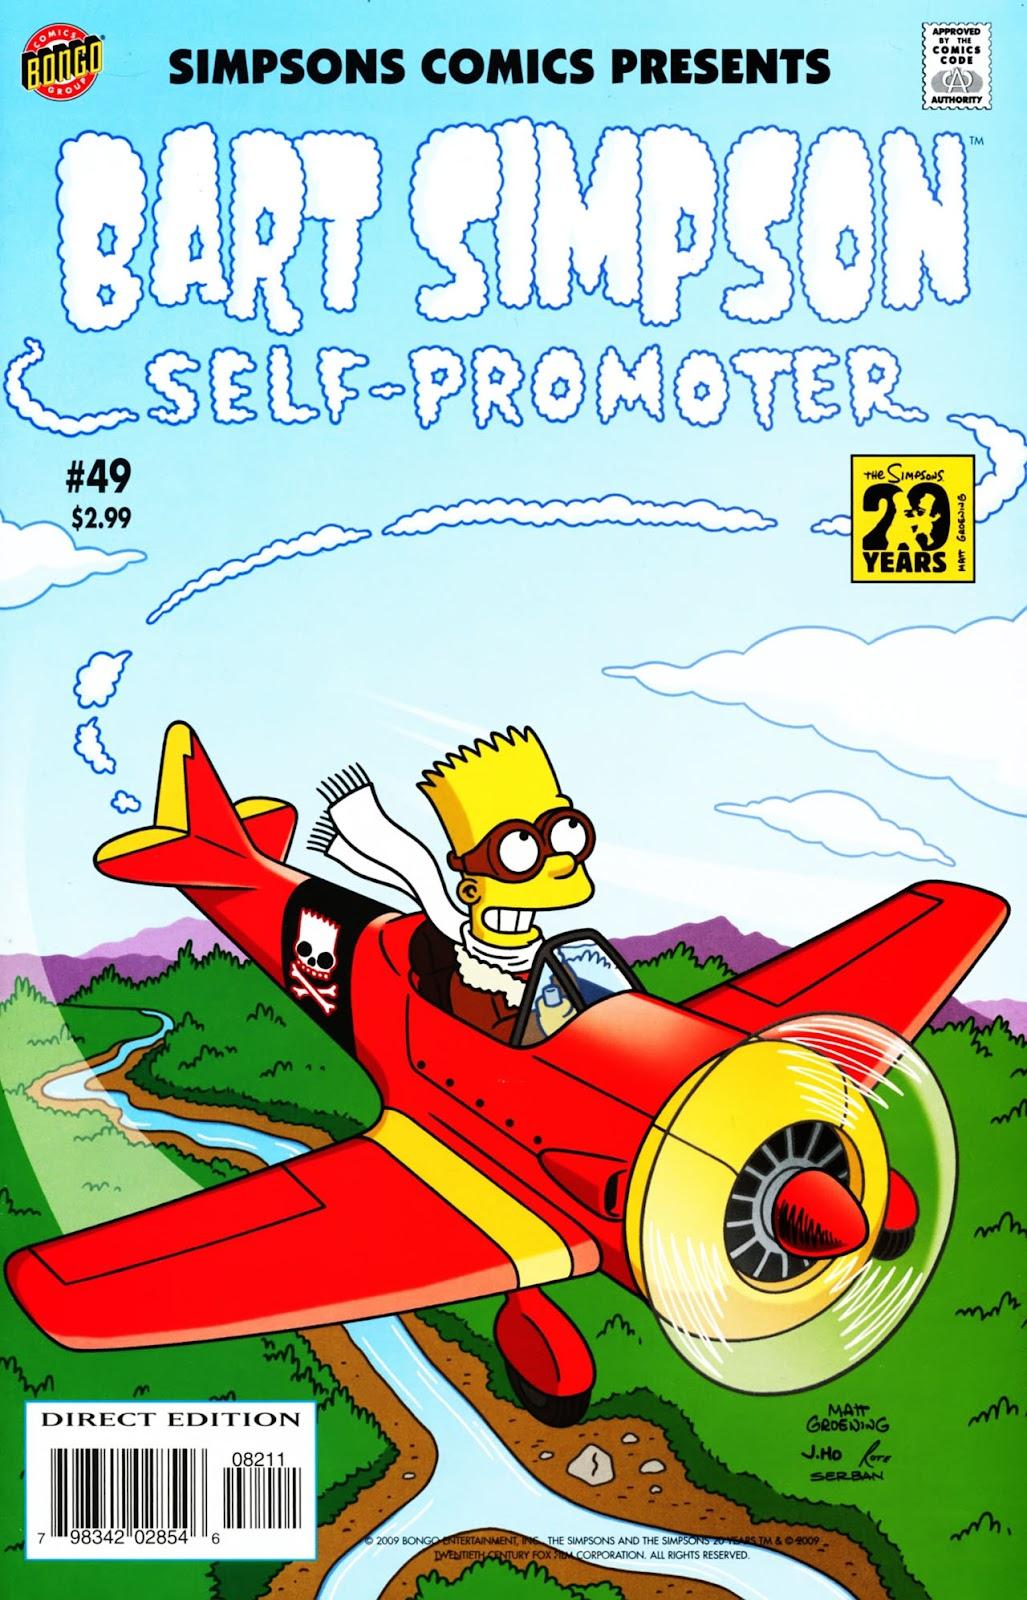 Simpsons Comics Presents Bart Simpson 49 Page 1